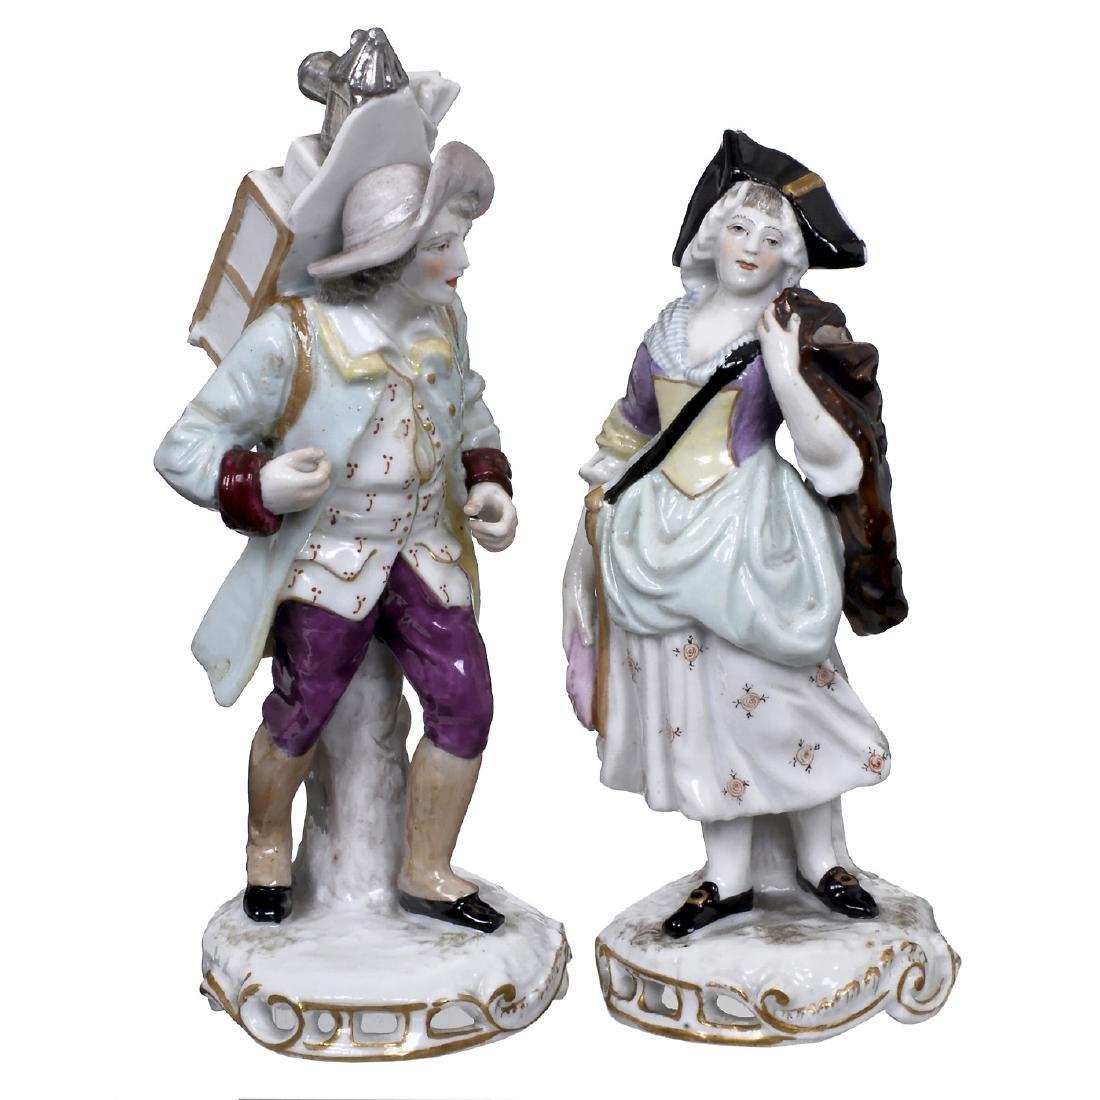 Figural Porcelain Group with Lanternist by Samson, c.